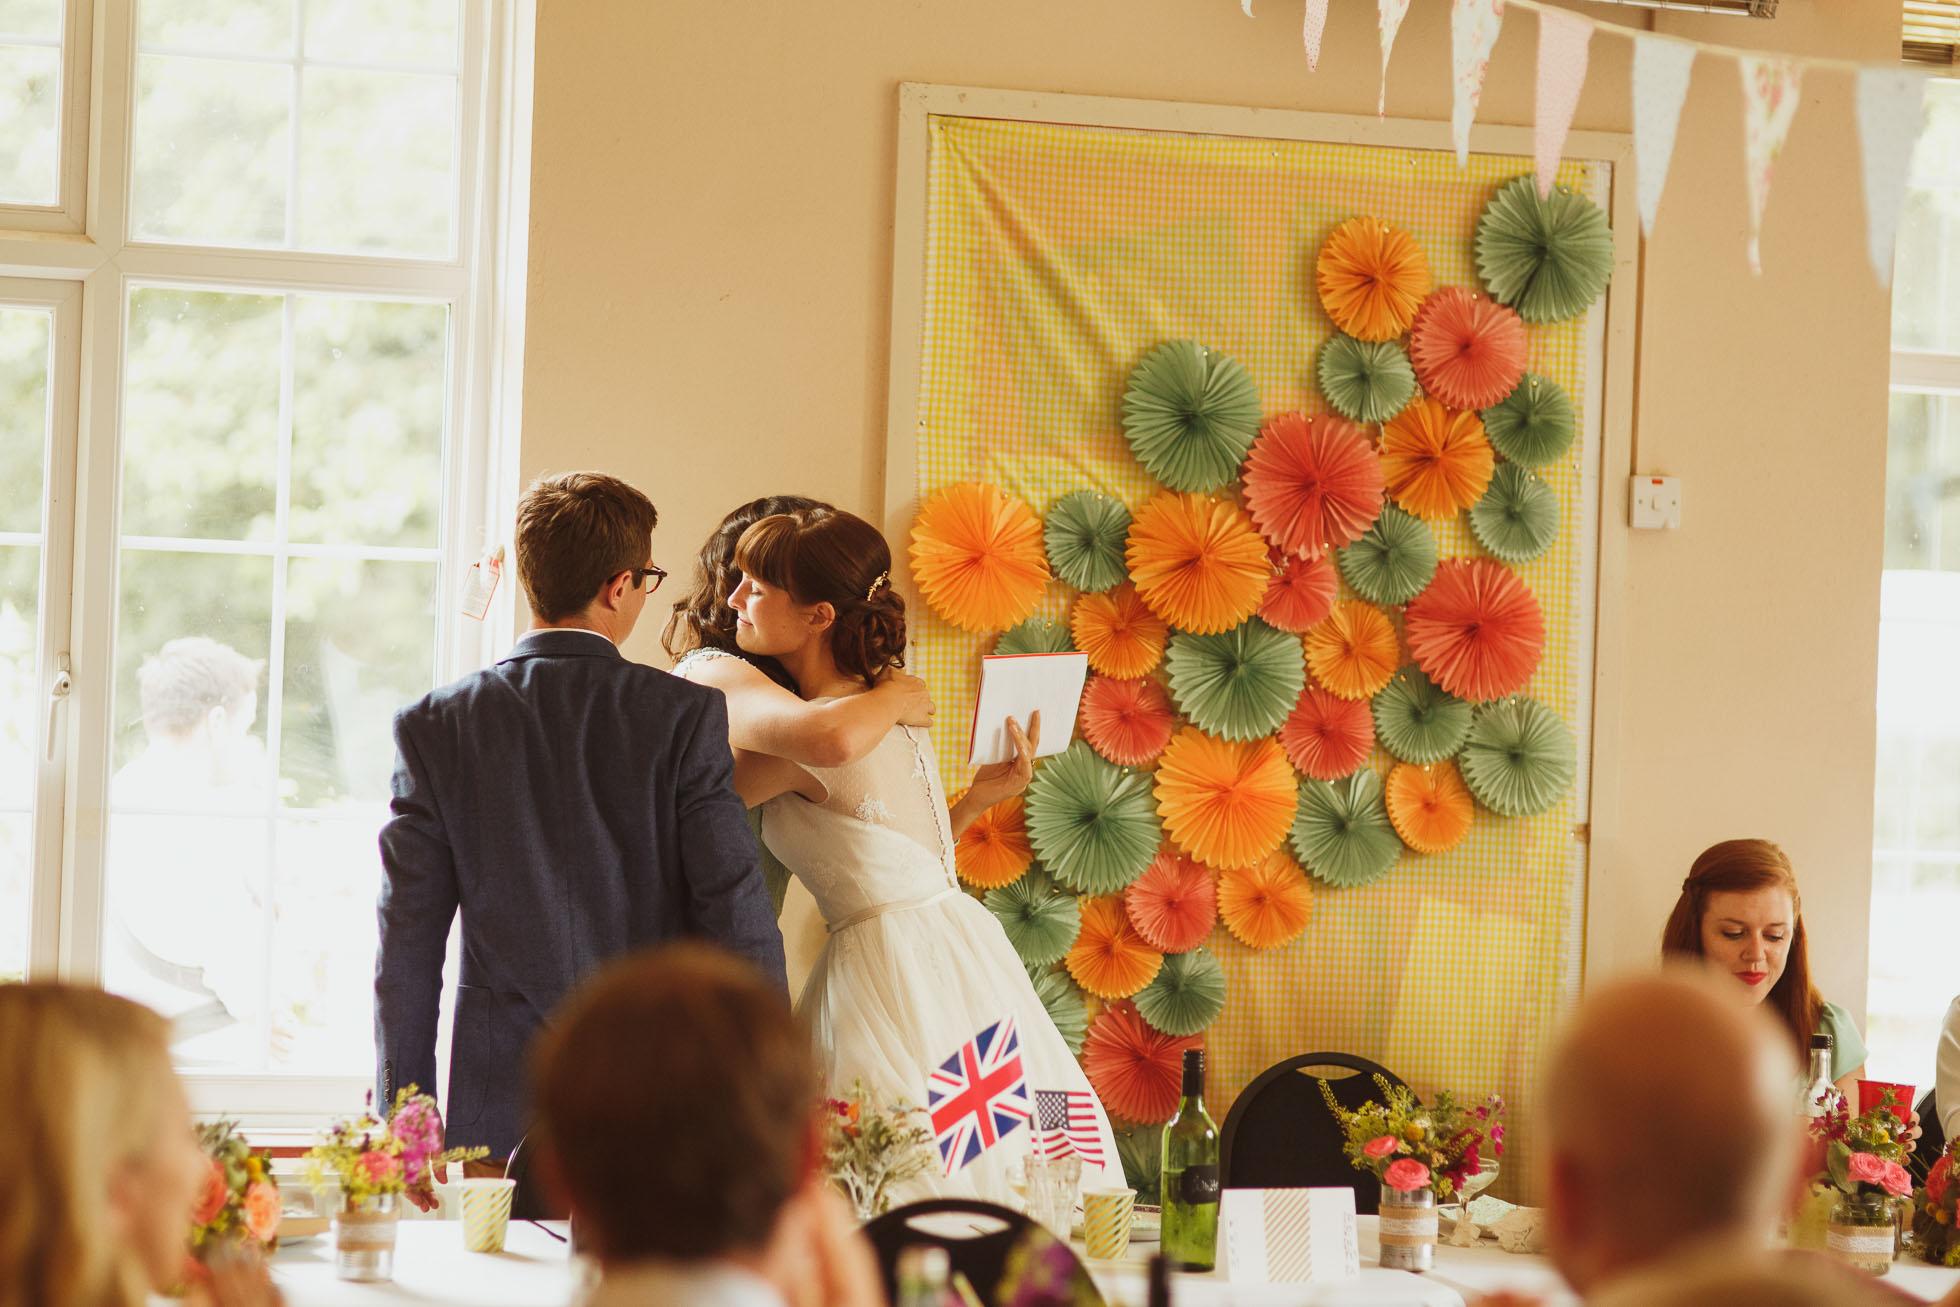 hackness wedding photographer-102.jpg